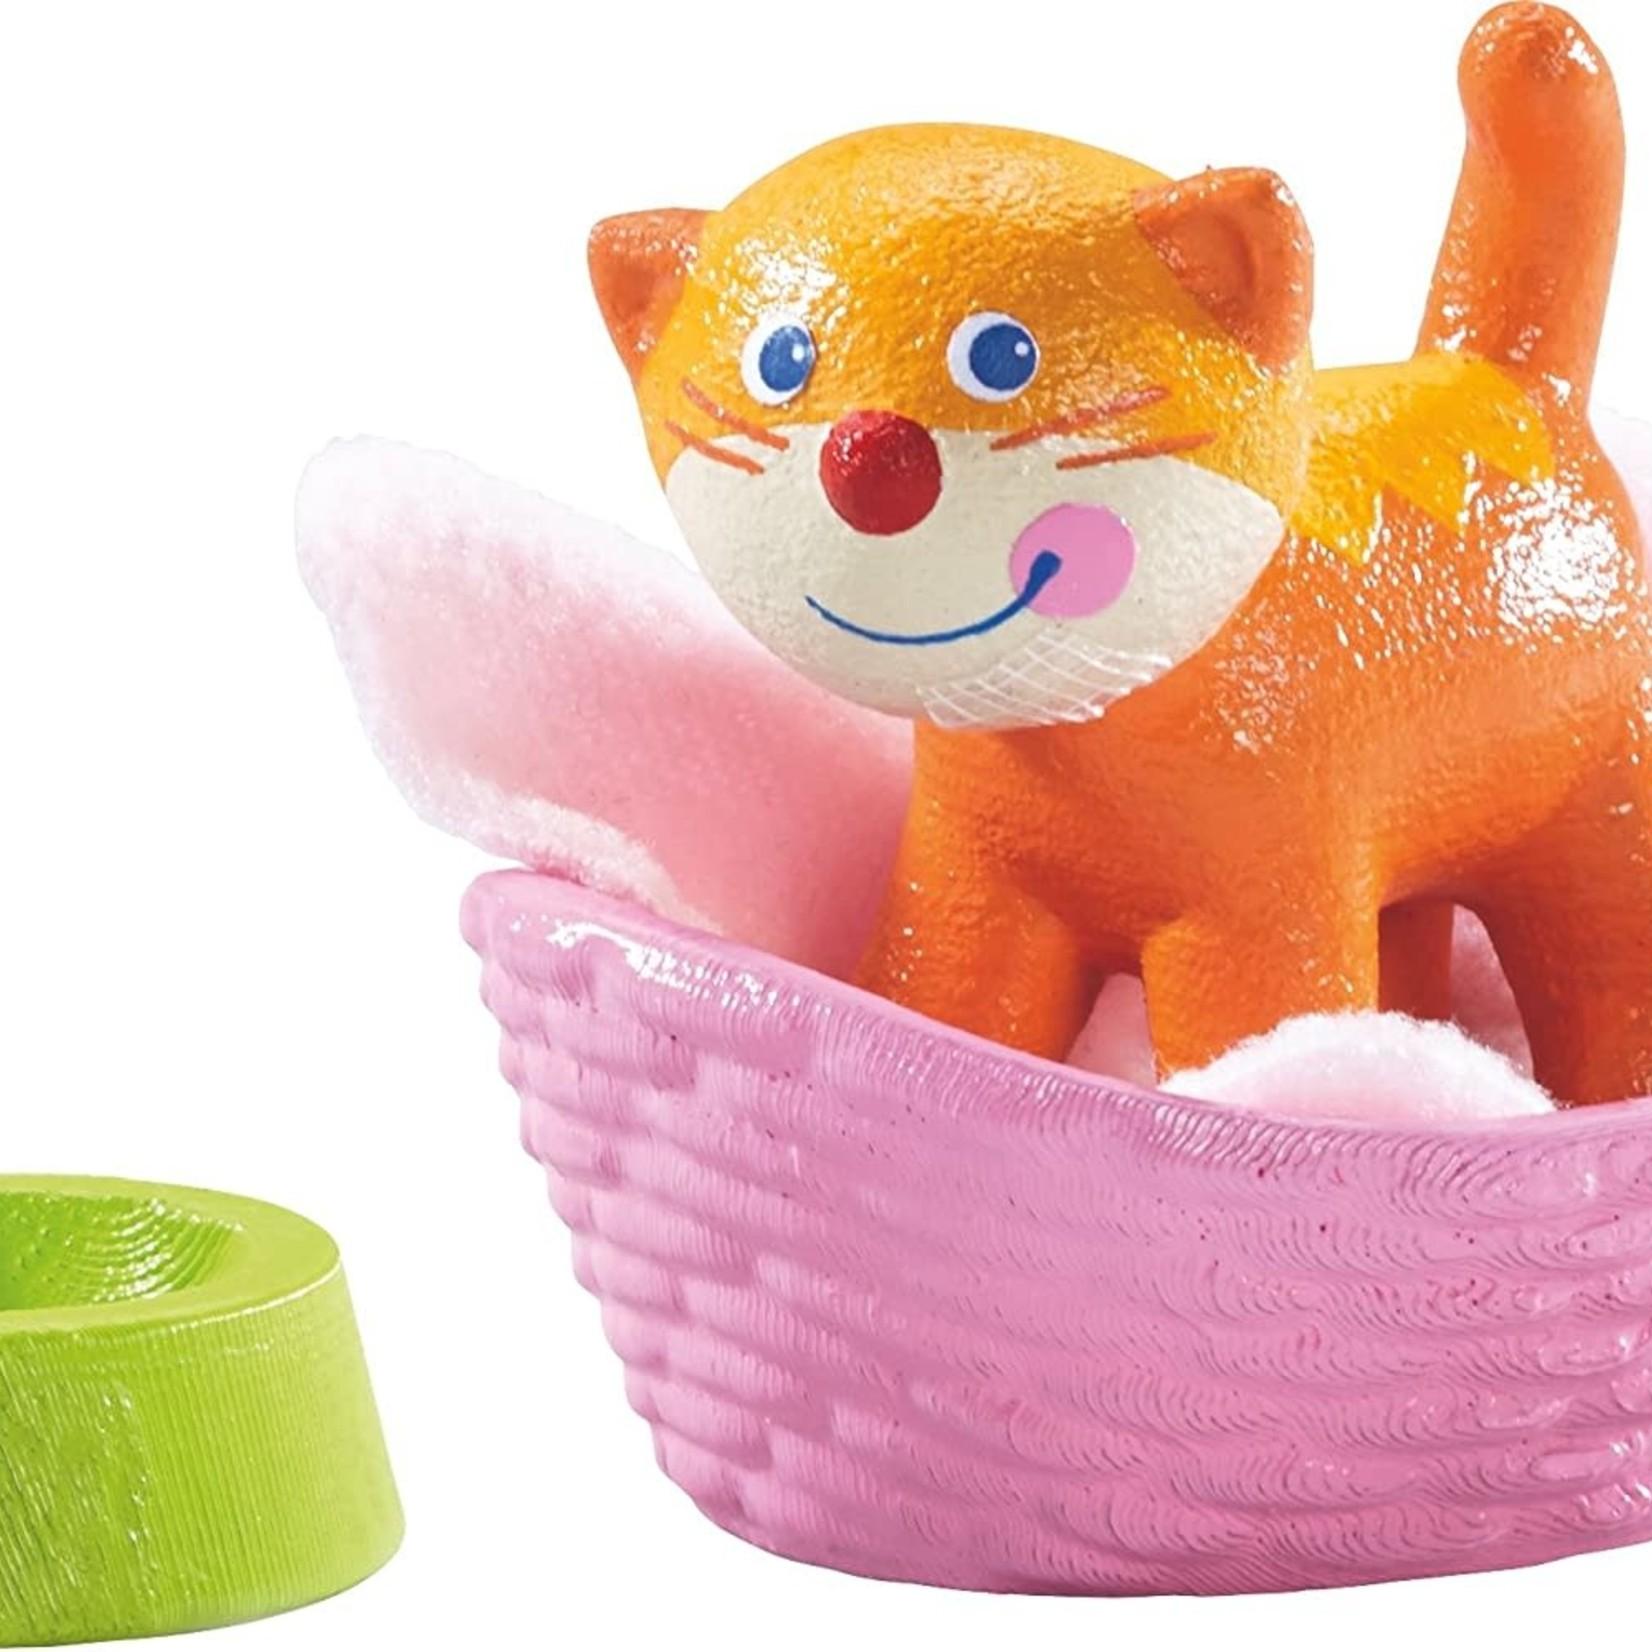 Haba Little Friends - Cat Kiki